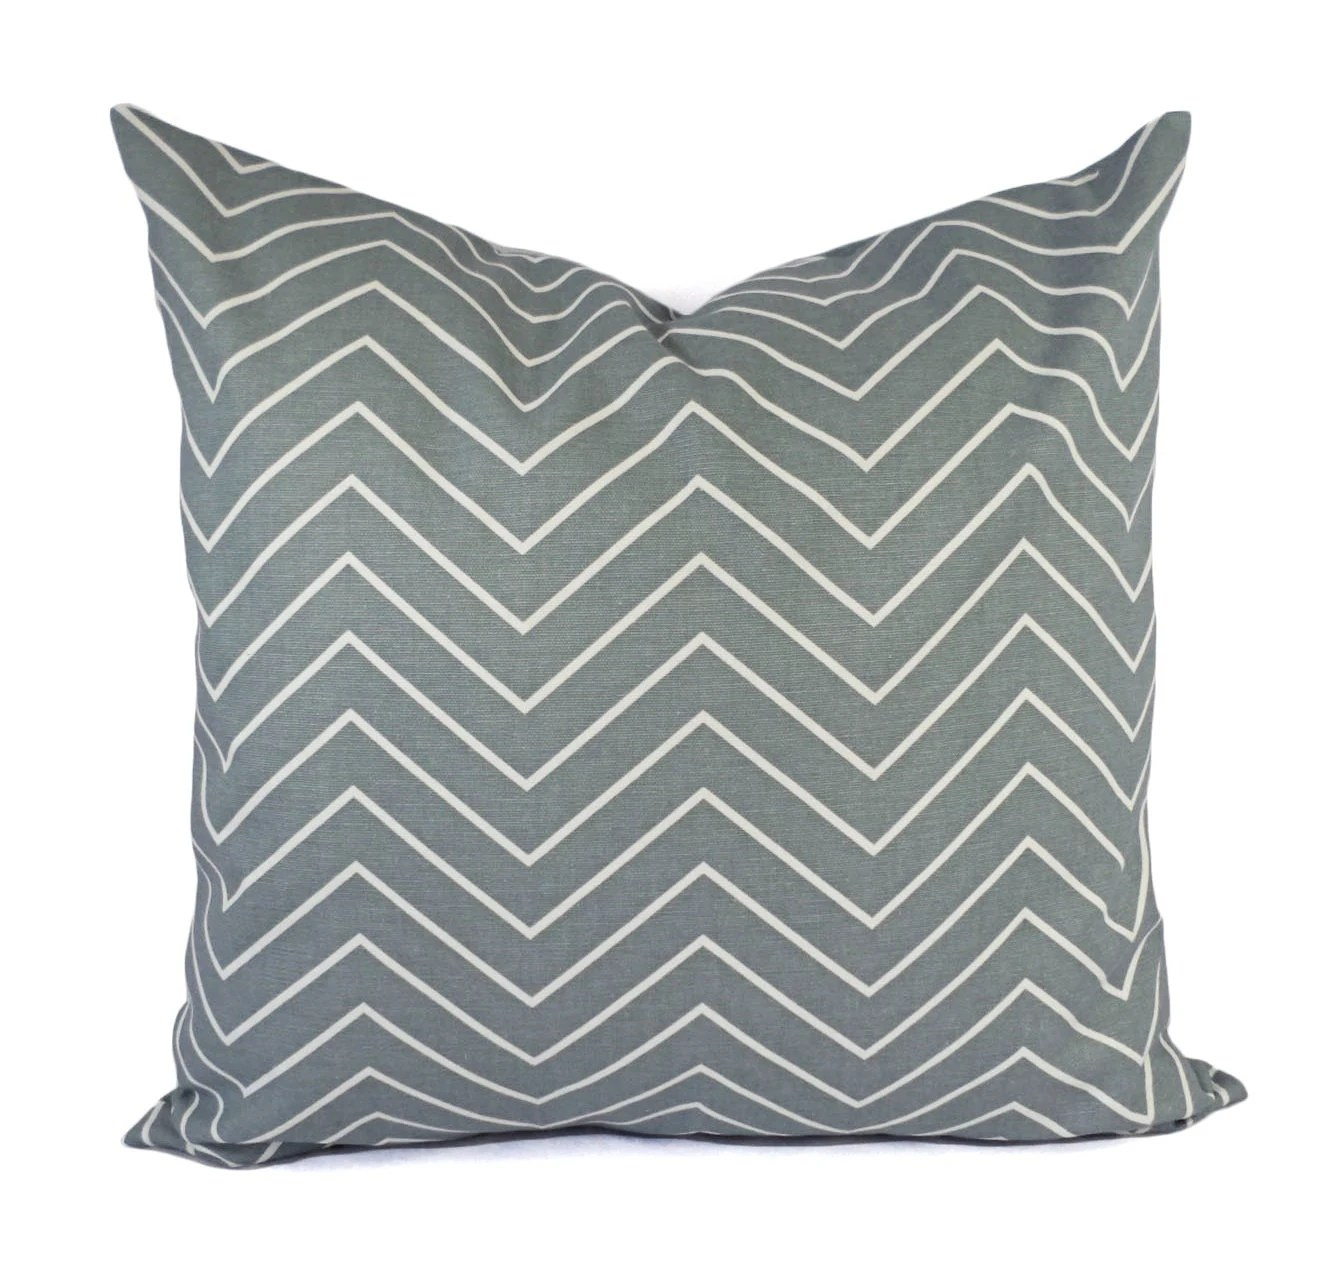 Two Pillow Covers Blue Grey Throw Pillows Chevron Pillow